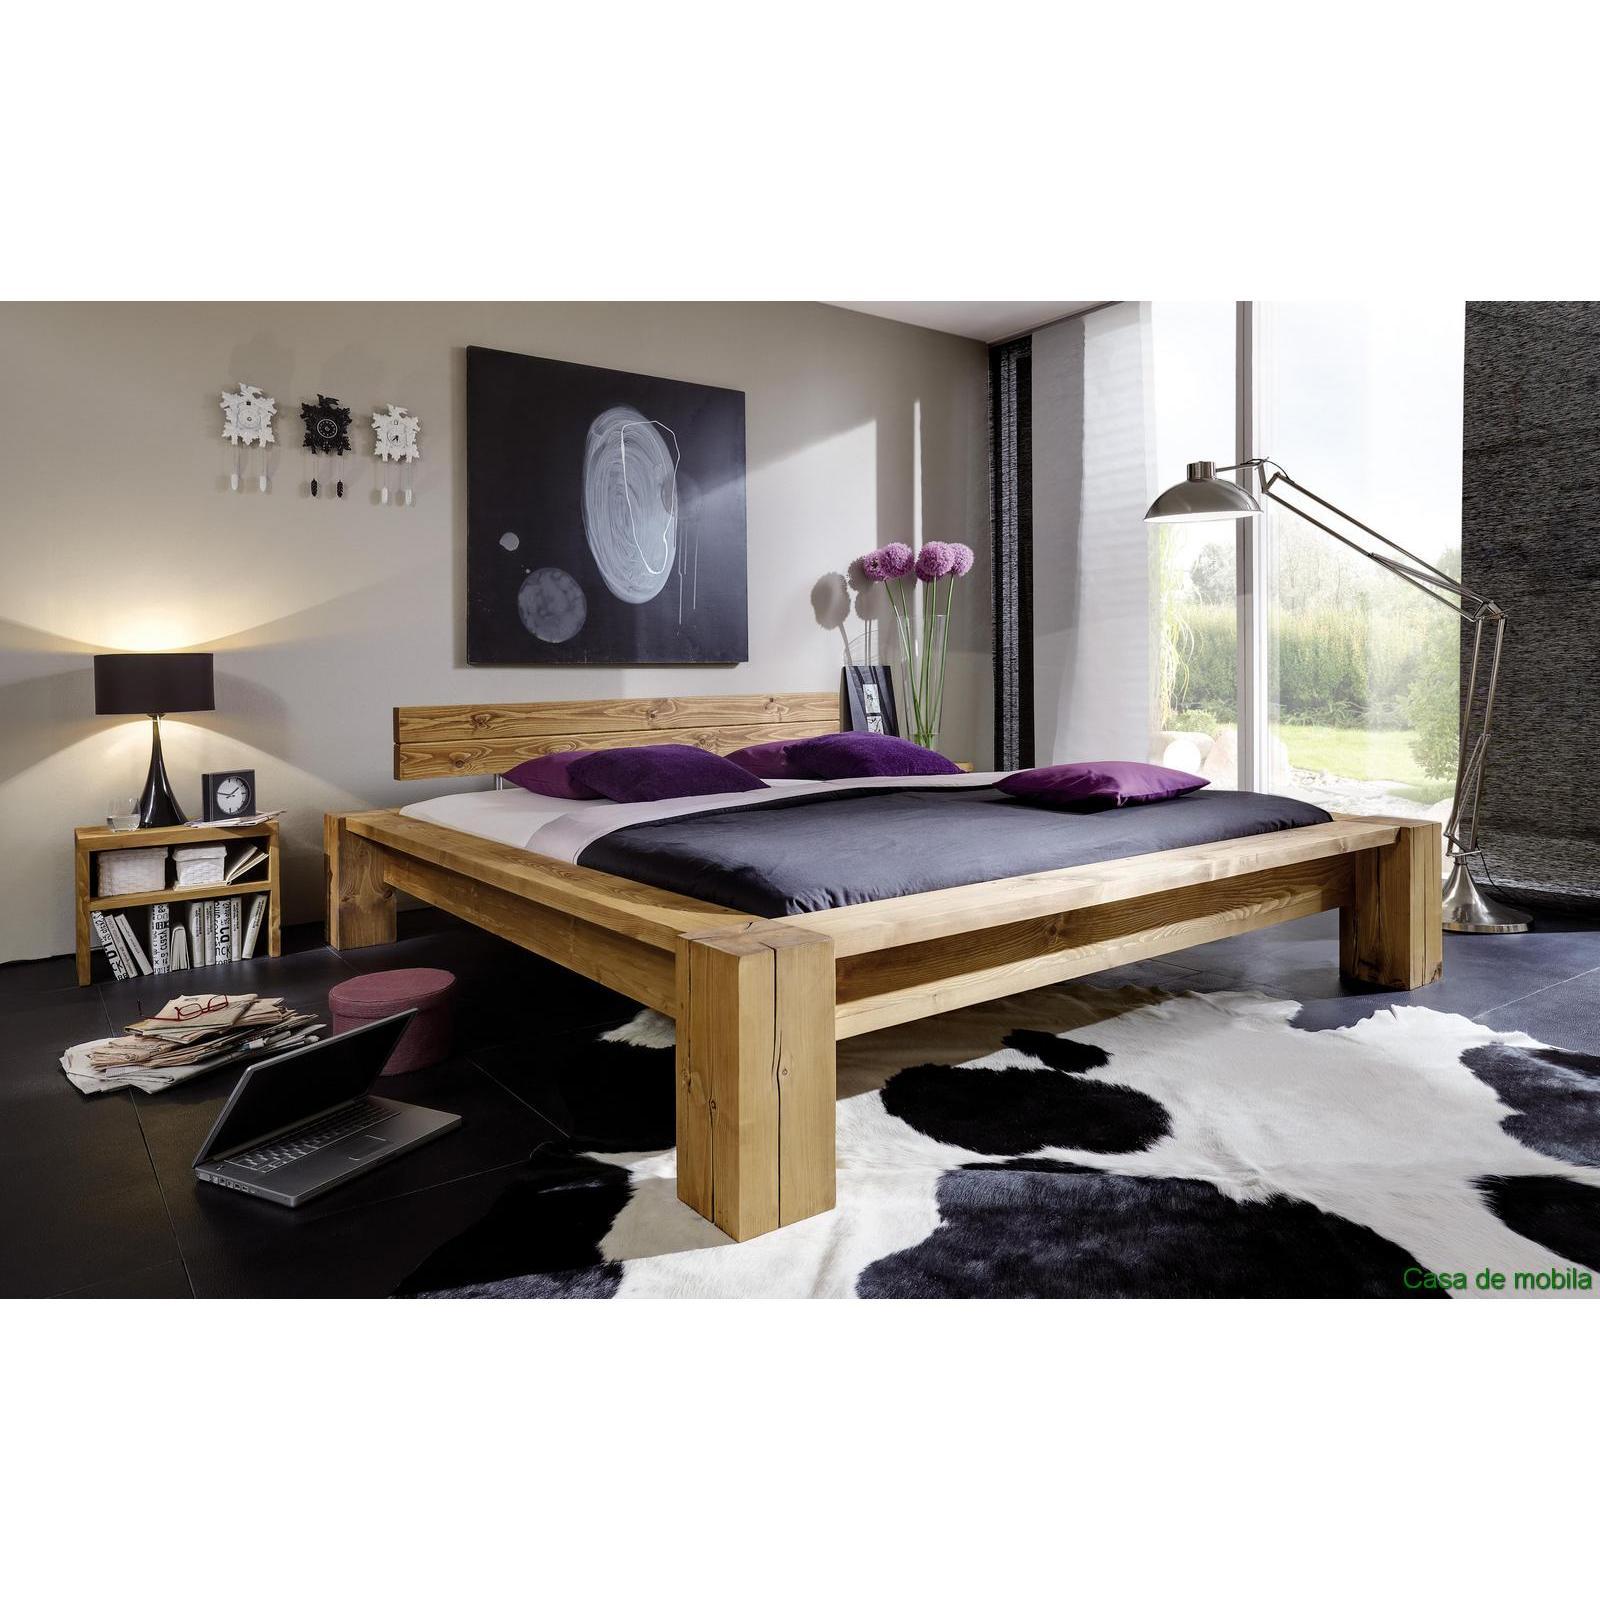 balkenbetten kiefer massiv holz antik gewachst taiga. Black Bedroom Furniture Sets. Home Design Ideas